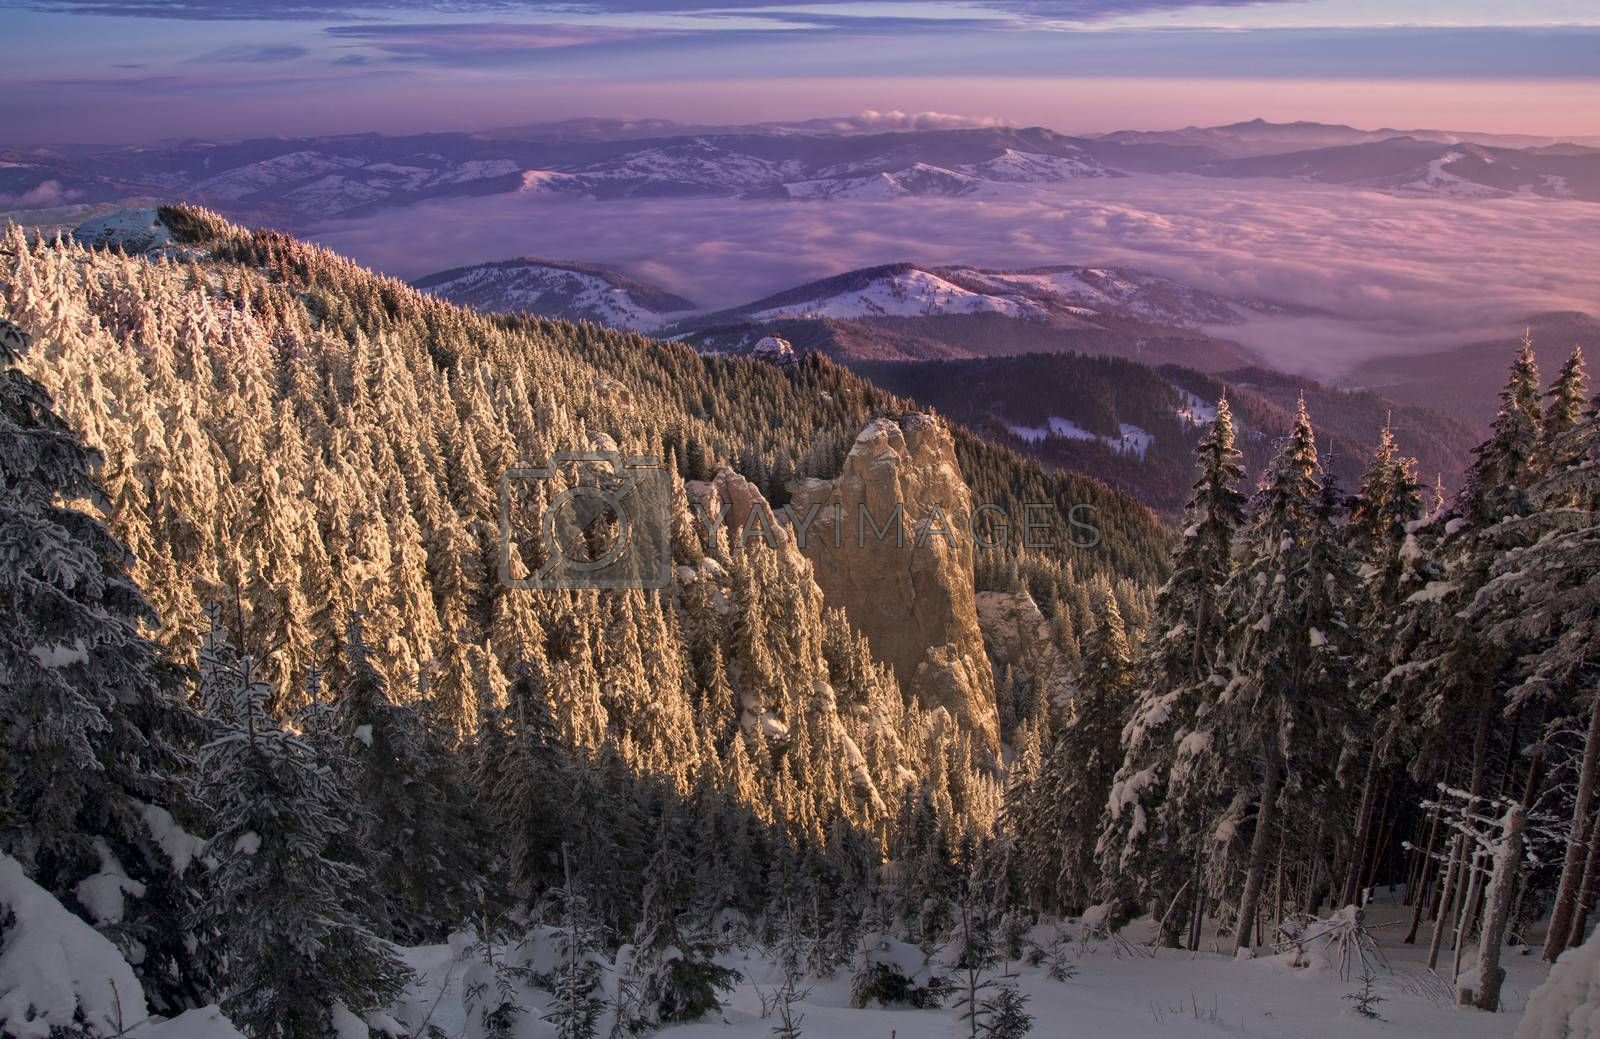 Landscape of winter mountain sunset in Romania